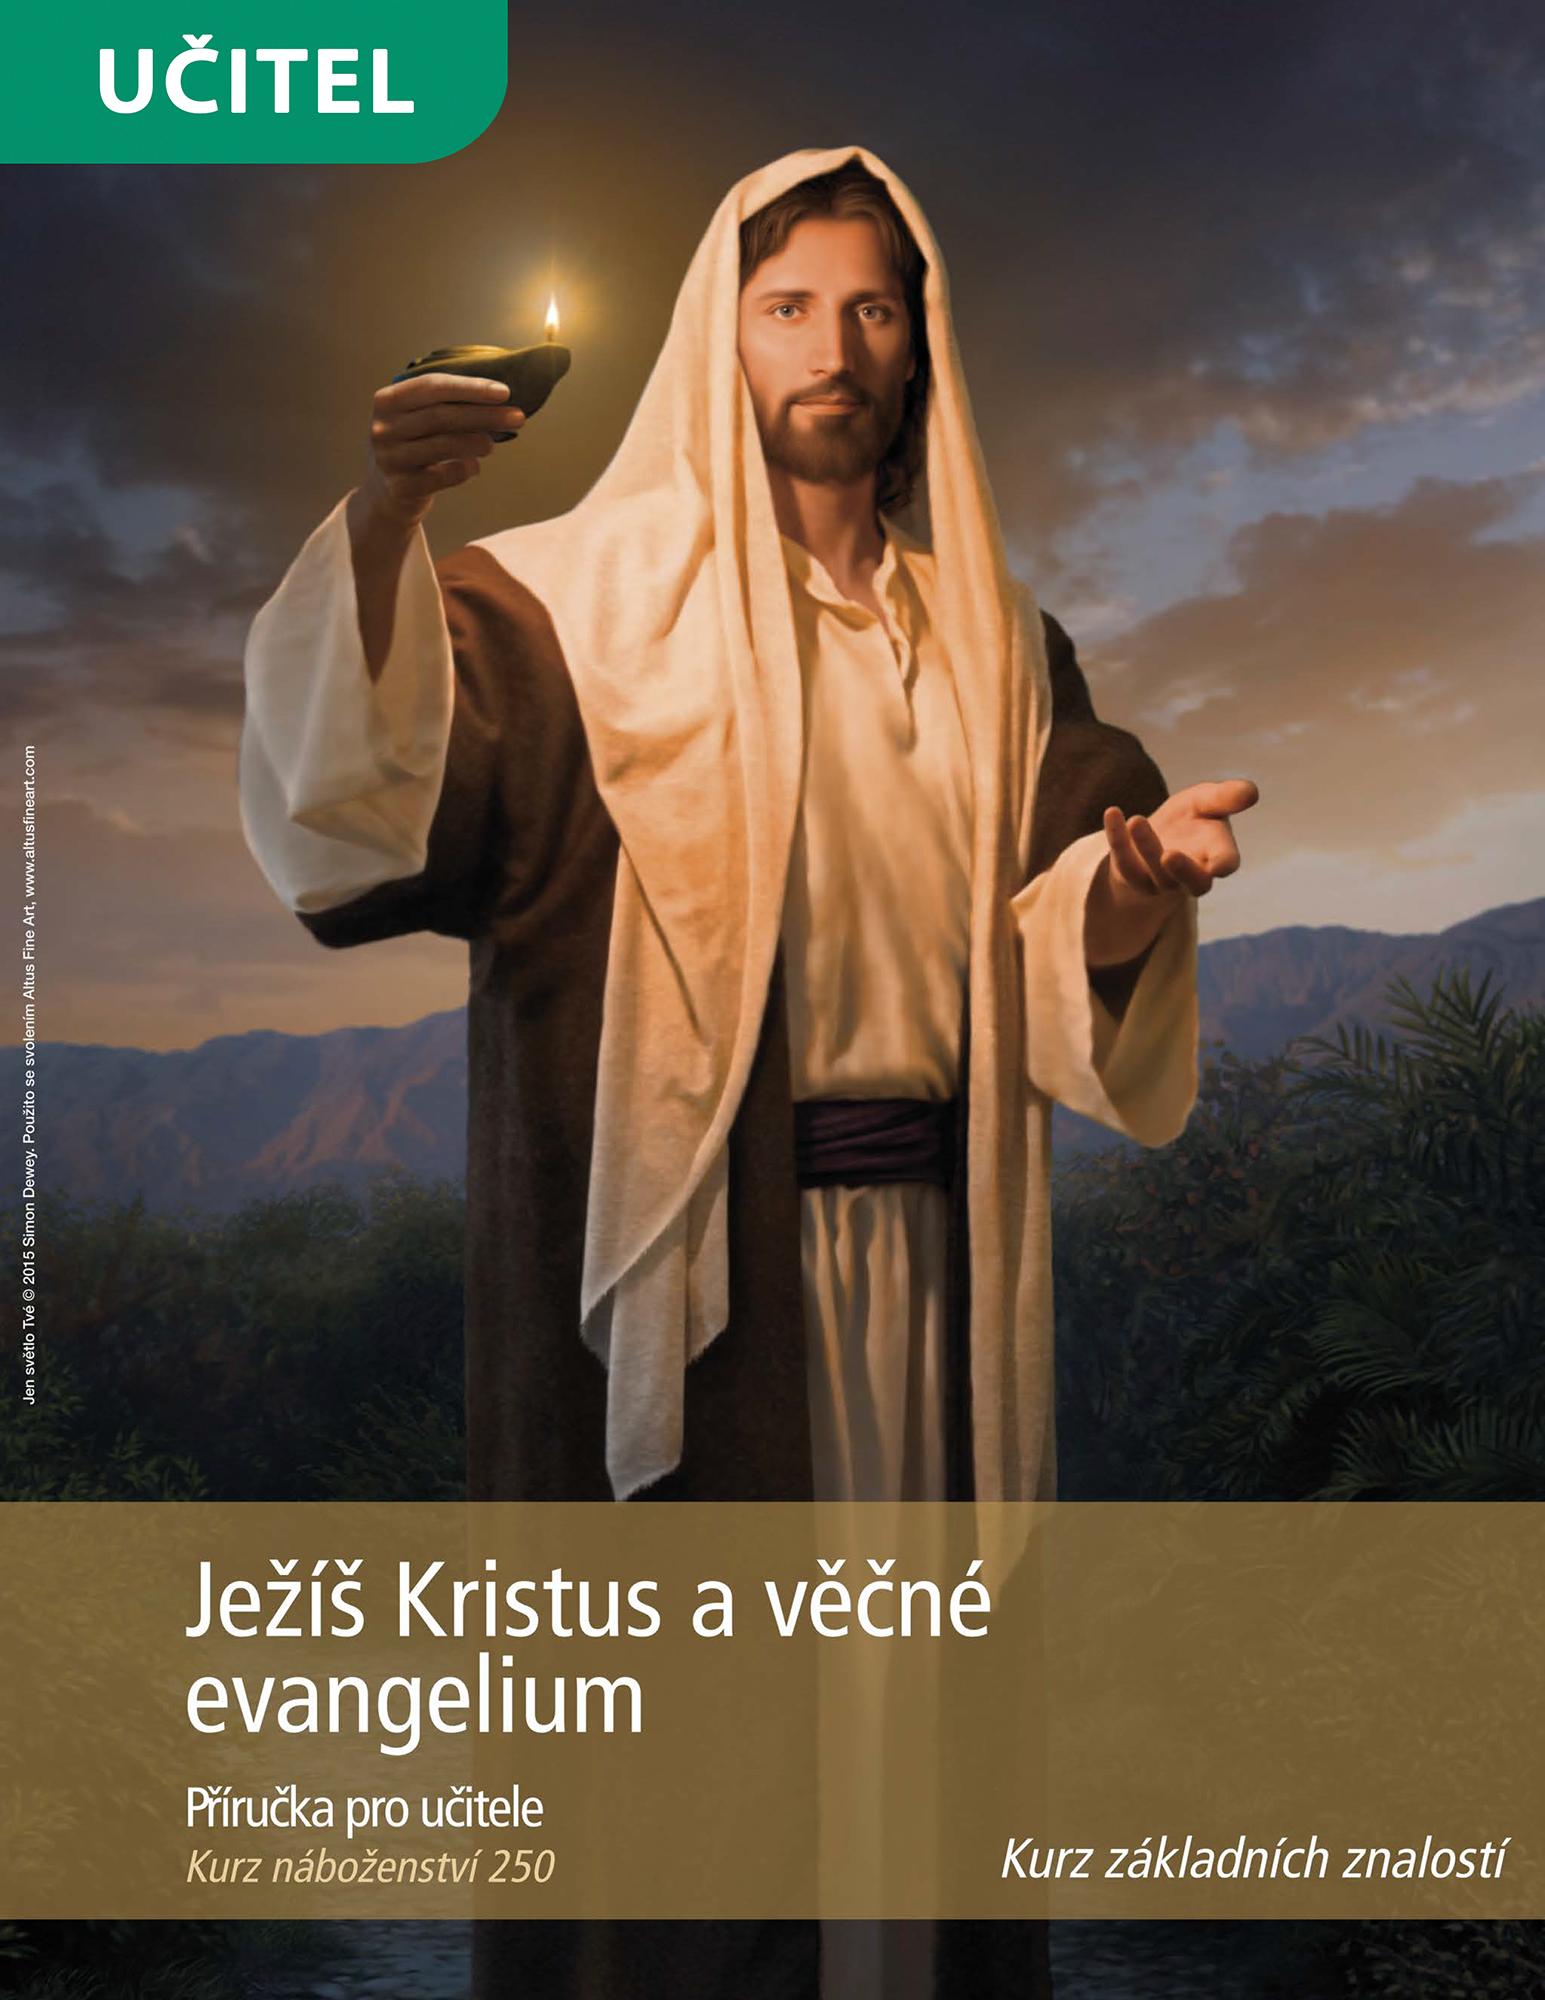 Ježíš Kristus avěčné evangelium (Kurz 250)